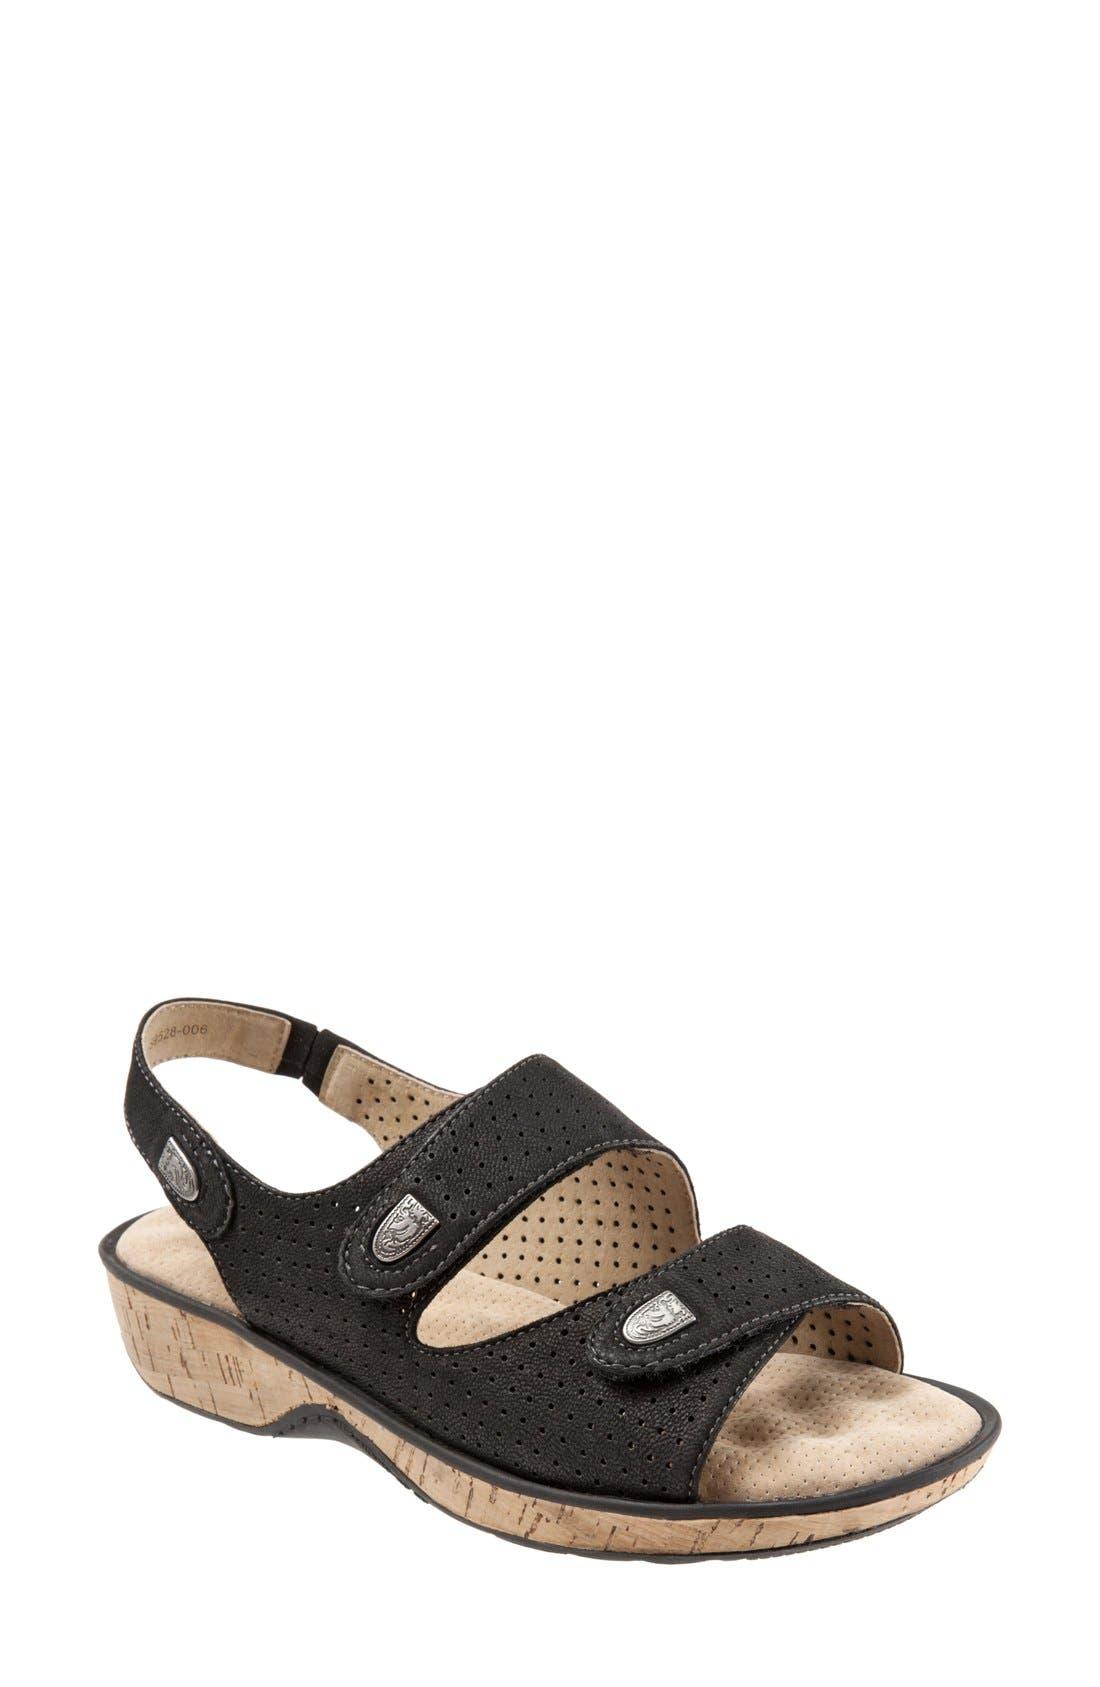 'Bolivia' Sandal,                         Main,                         color, Black Perforated Leather